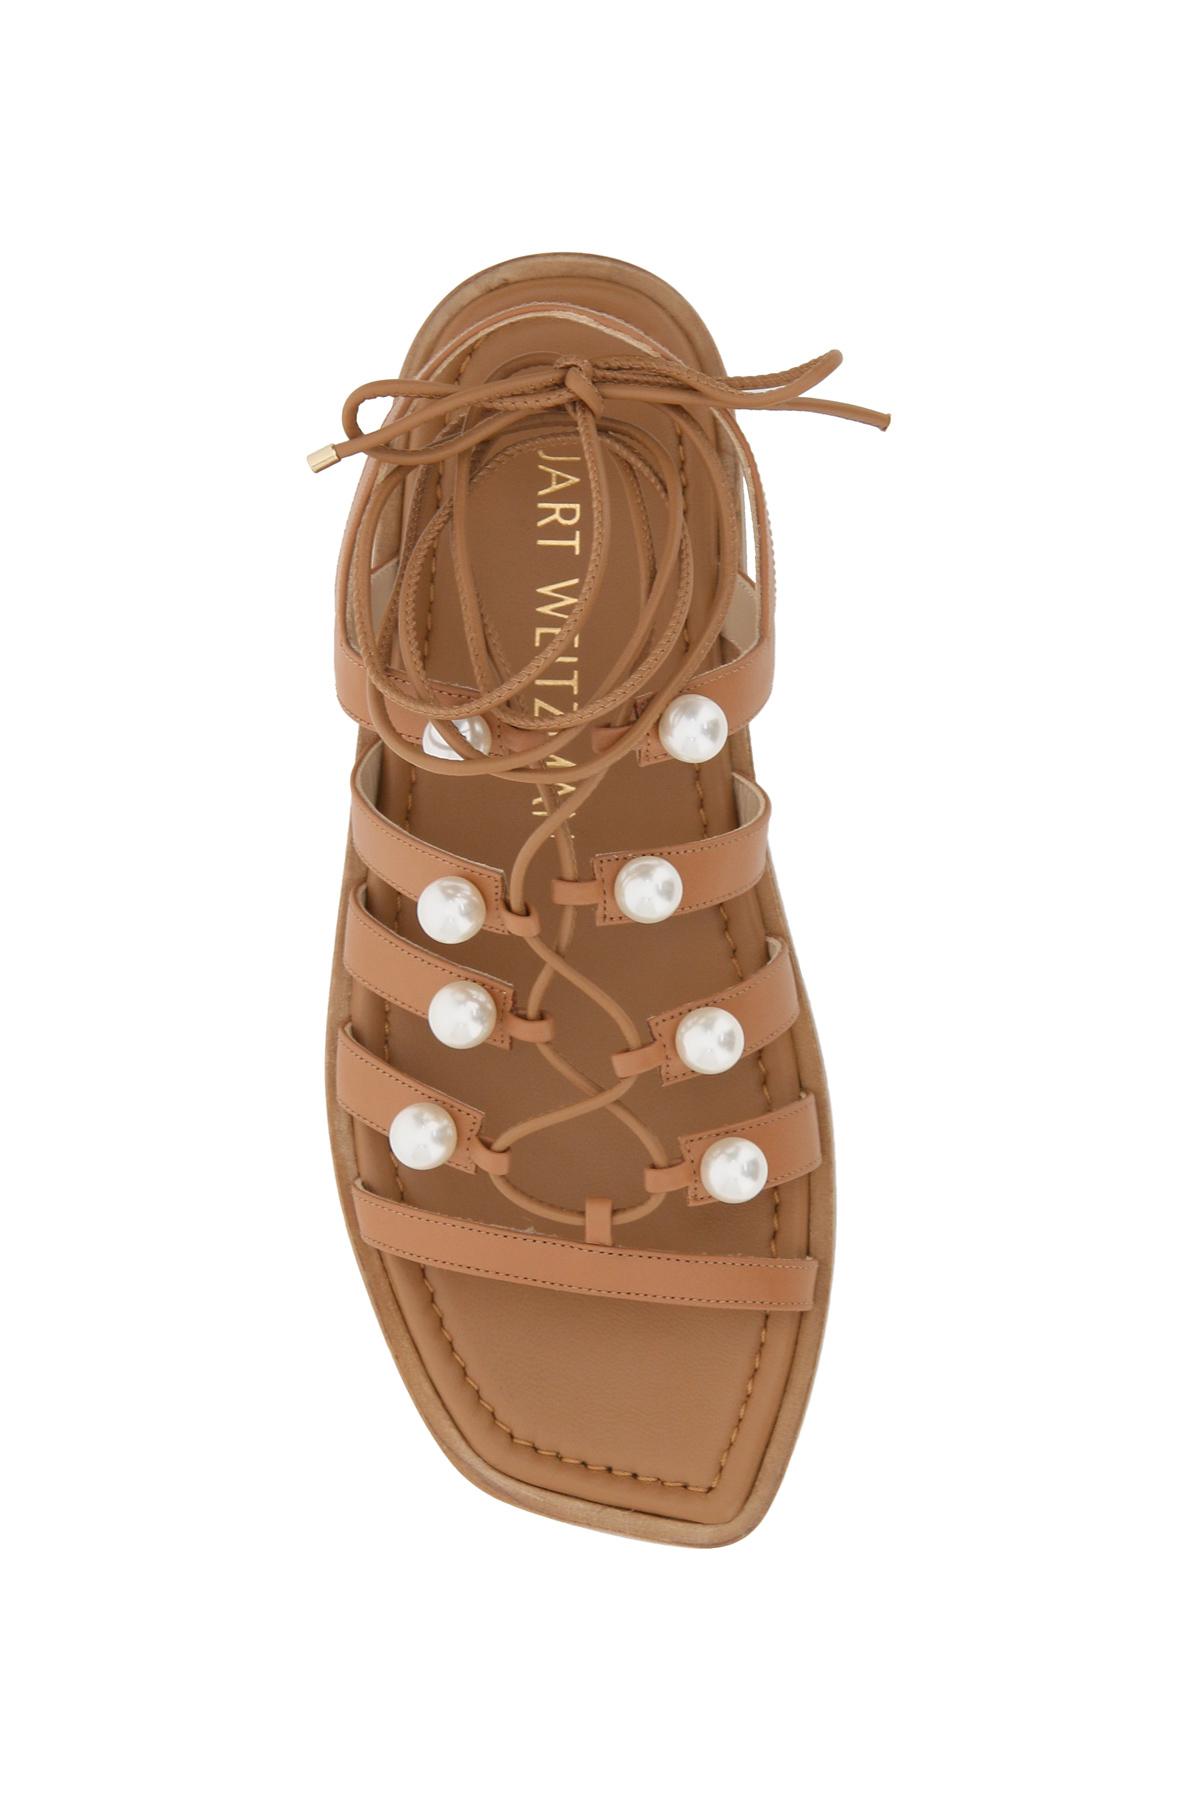 Stuart weitzman sandali goldie lace-up pearls